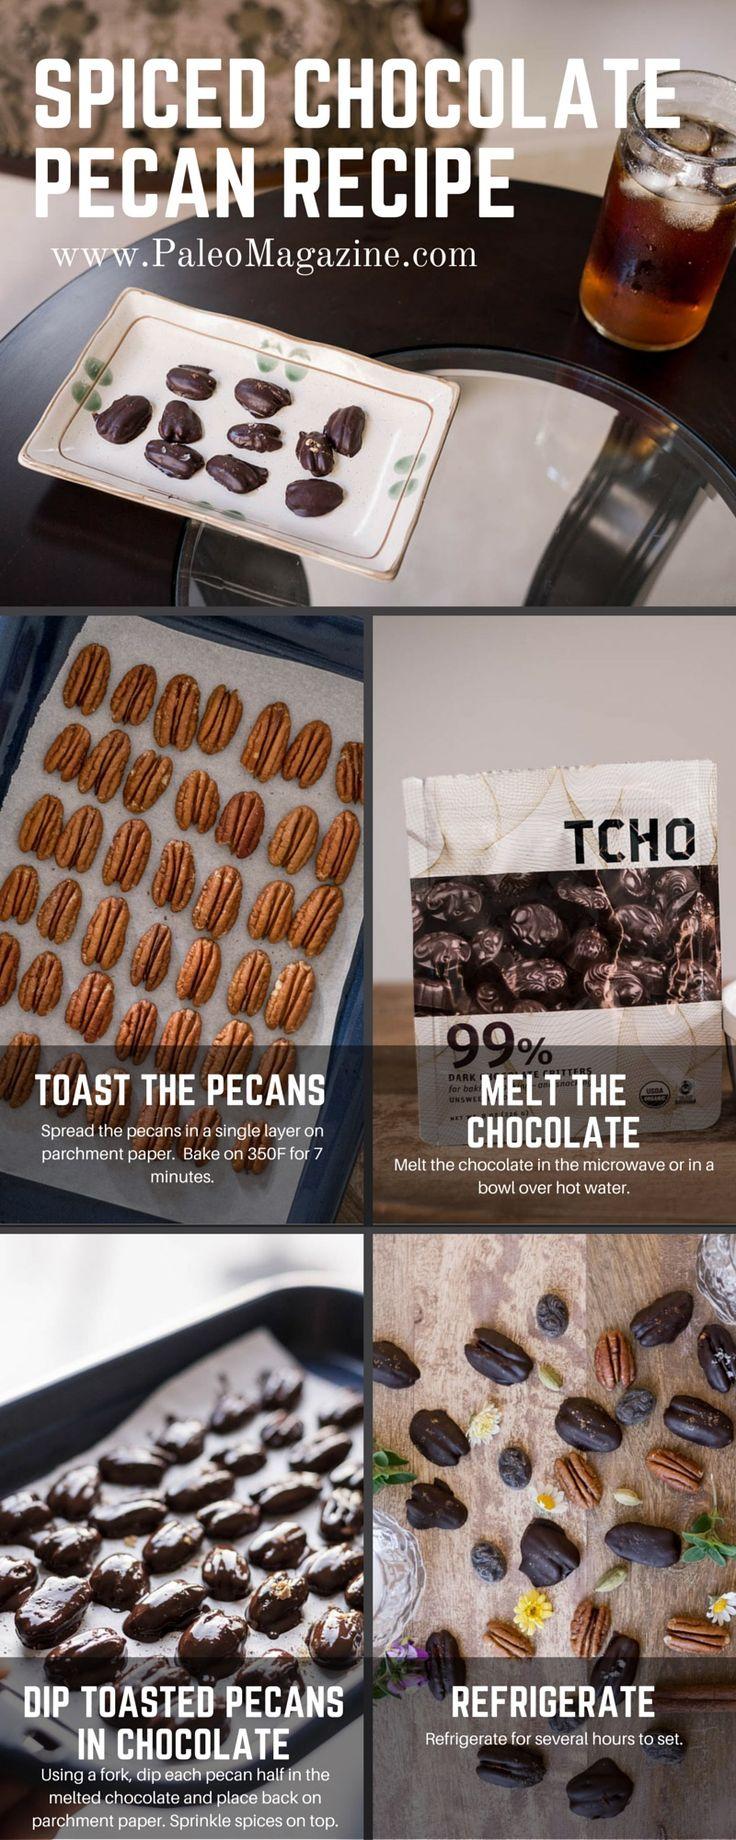 Chocolate Covered Pecans Recipe [Paleo, Keto, Primal, Diabetic-Friendly, Sugar-Free]   http://paleomagazine.com/spiced-chocolate-covered-pecans-recipe-keto-paleo